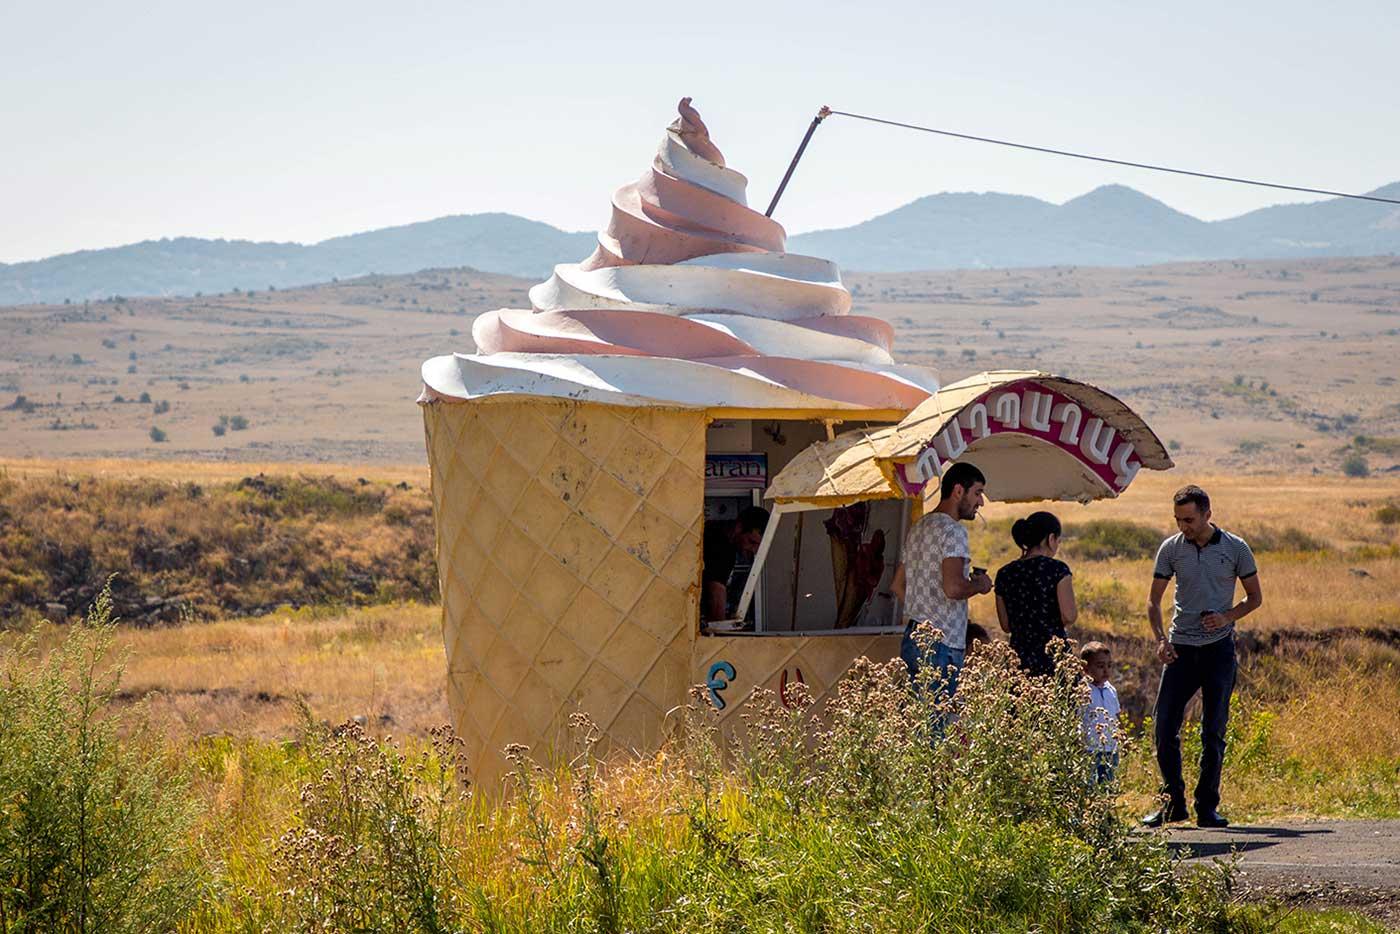 Ice creams in Artashavan, a village on the Western side of Mount Aragats.